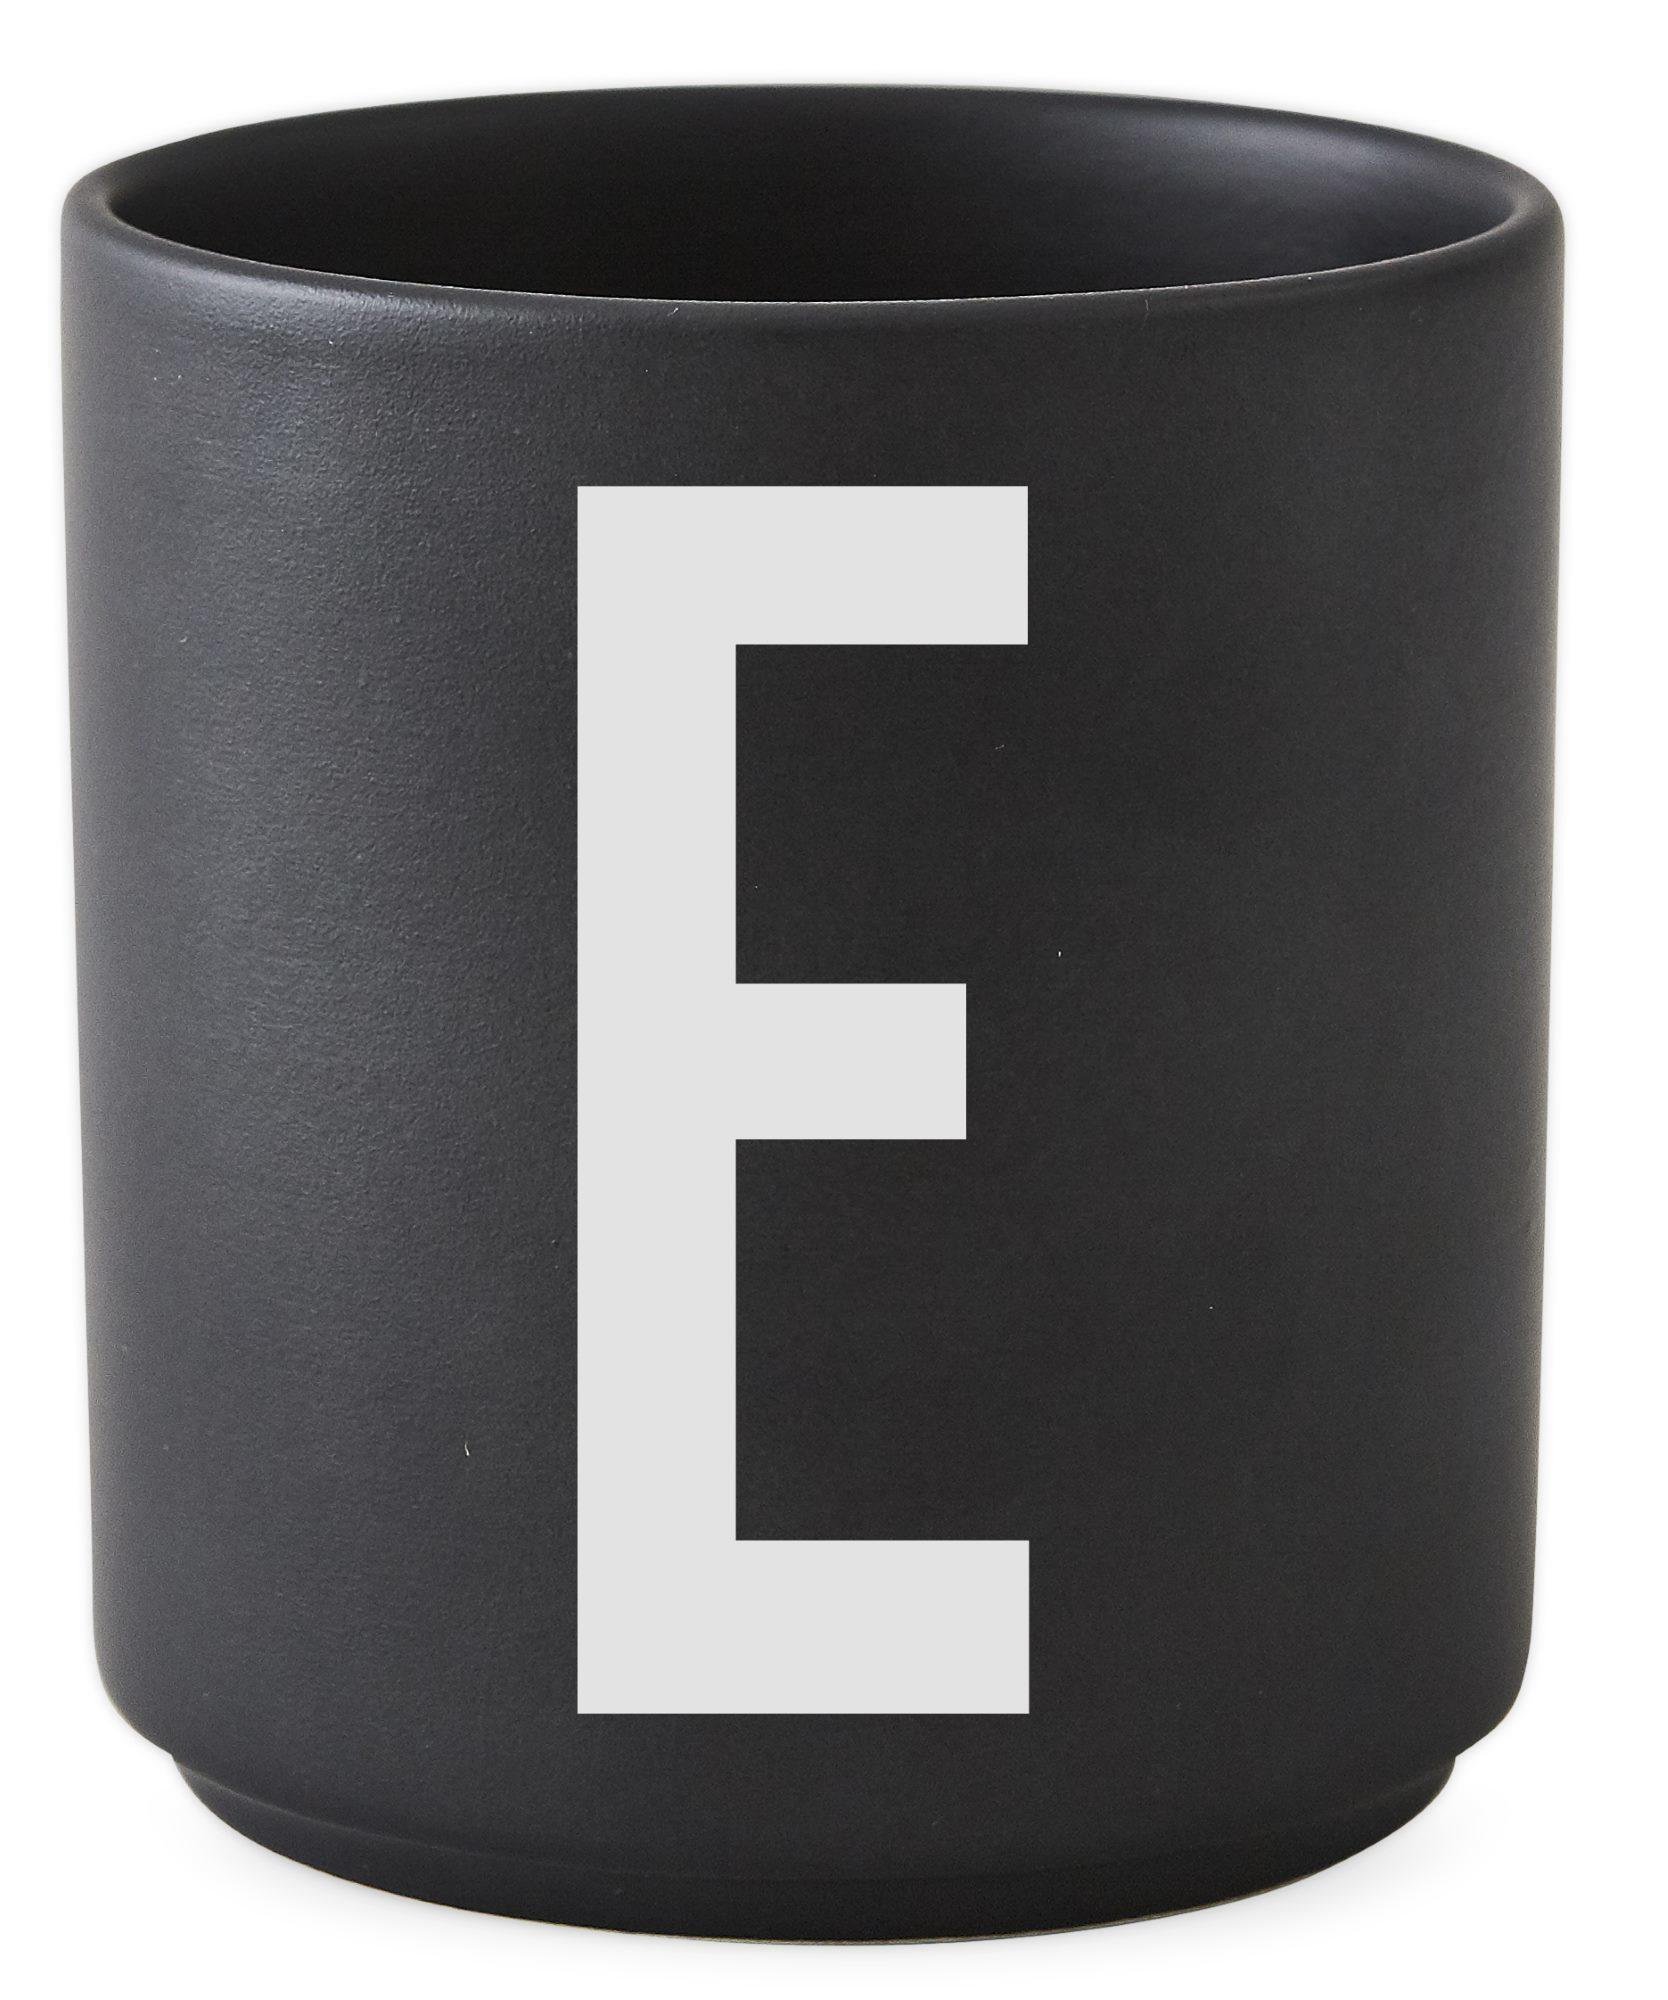 Cup black Design Letters